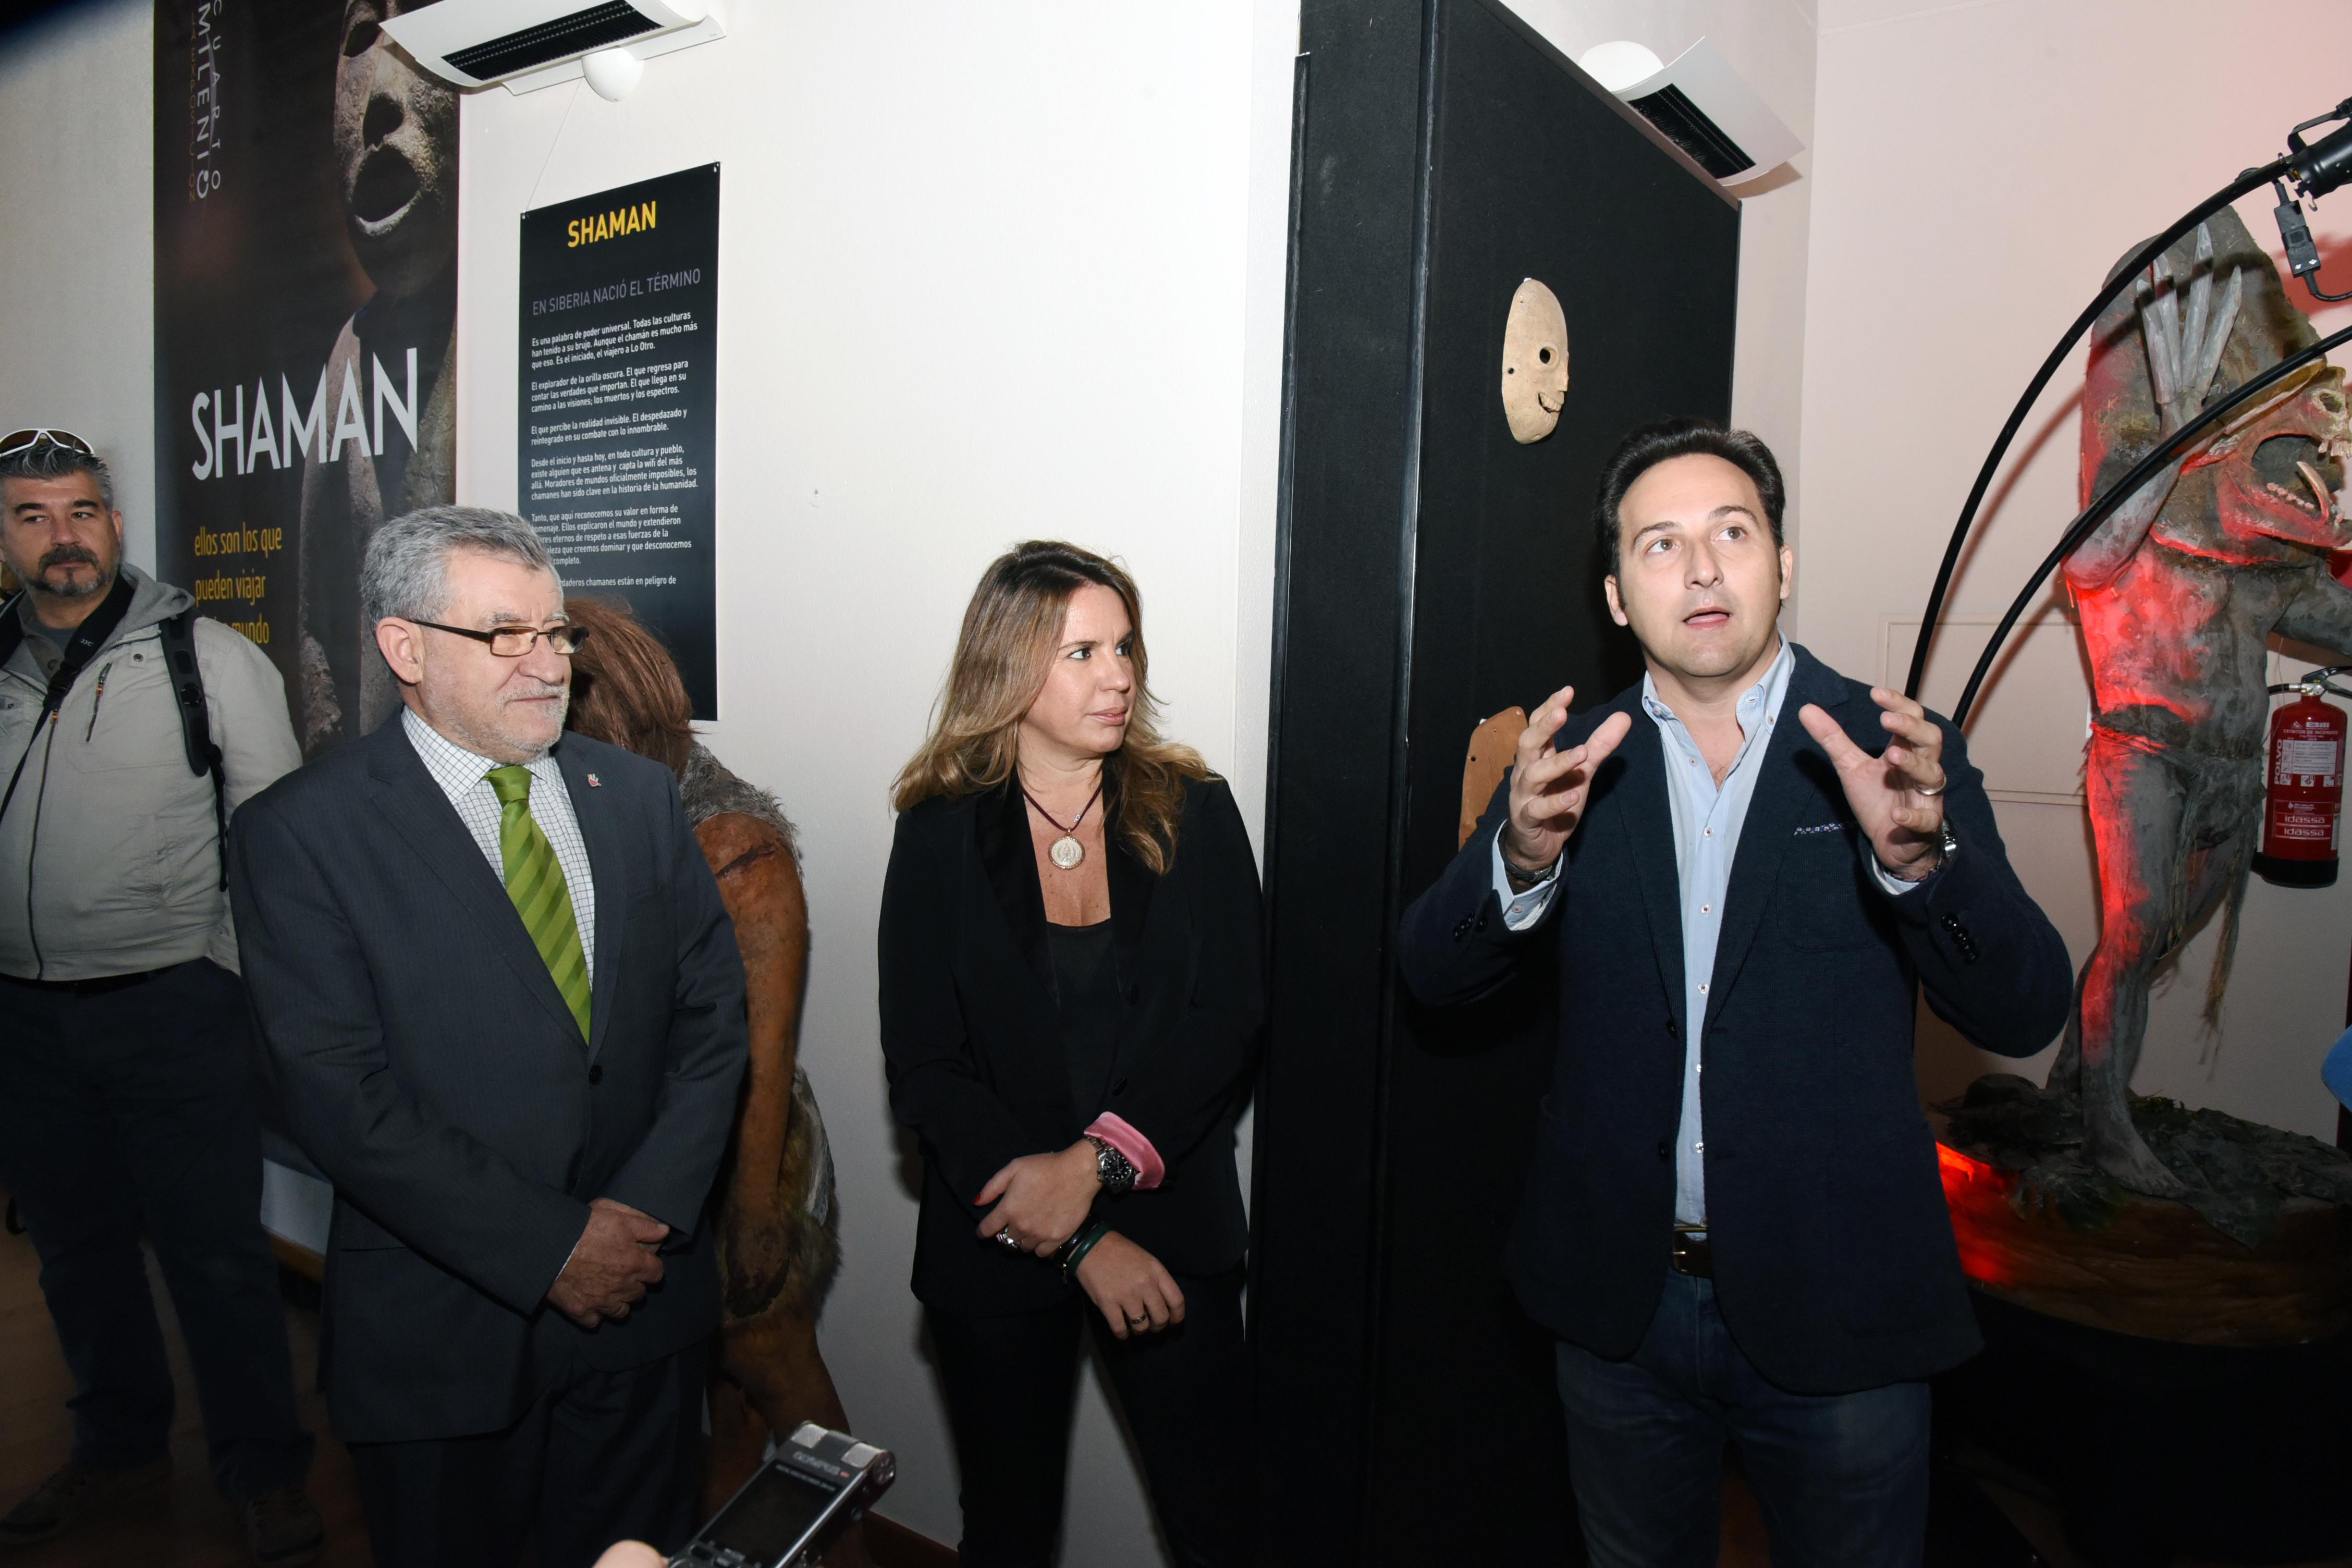 Datei:Inauguración exposición \'Cuarto milenio\' (31906217200).jpg ...